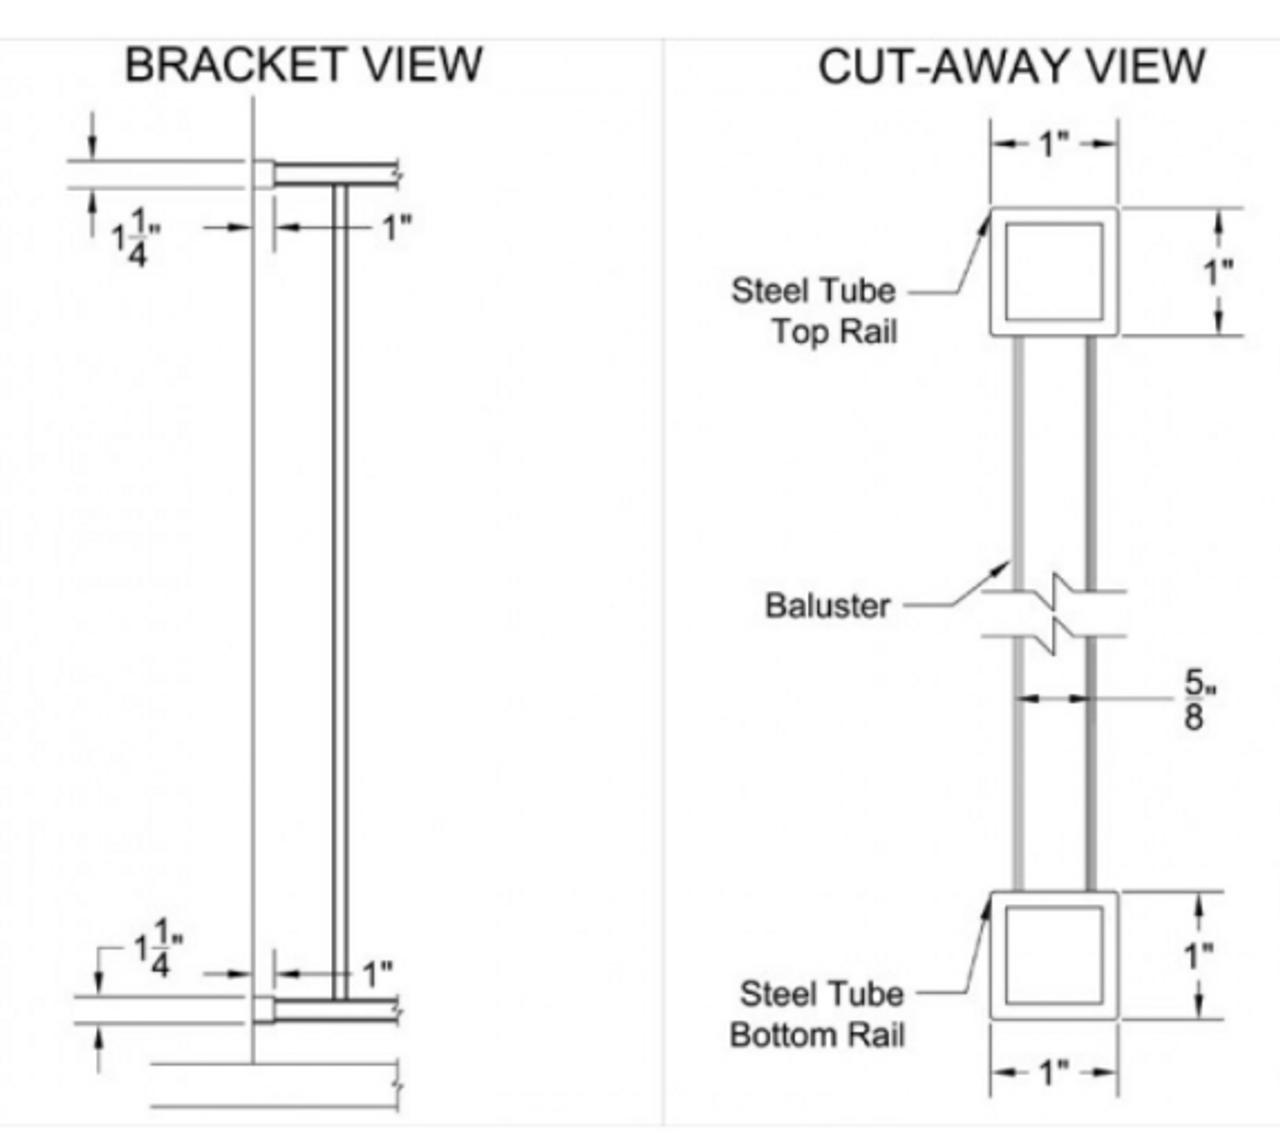 RDI Excalibur Steel Rail Panel Bracket and Profile Views